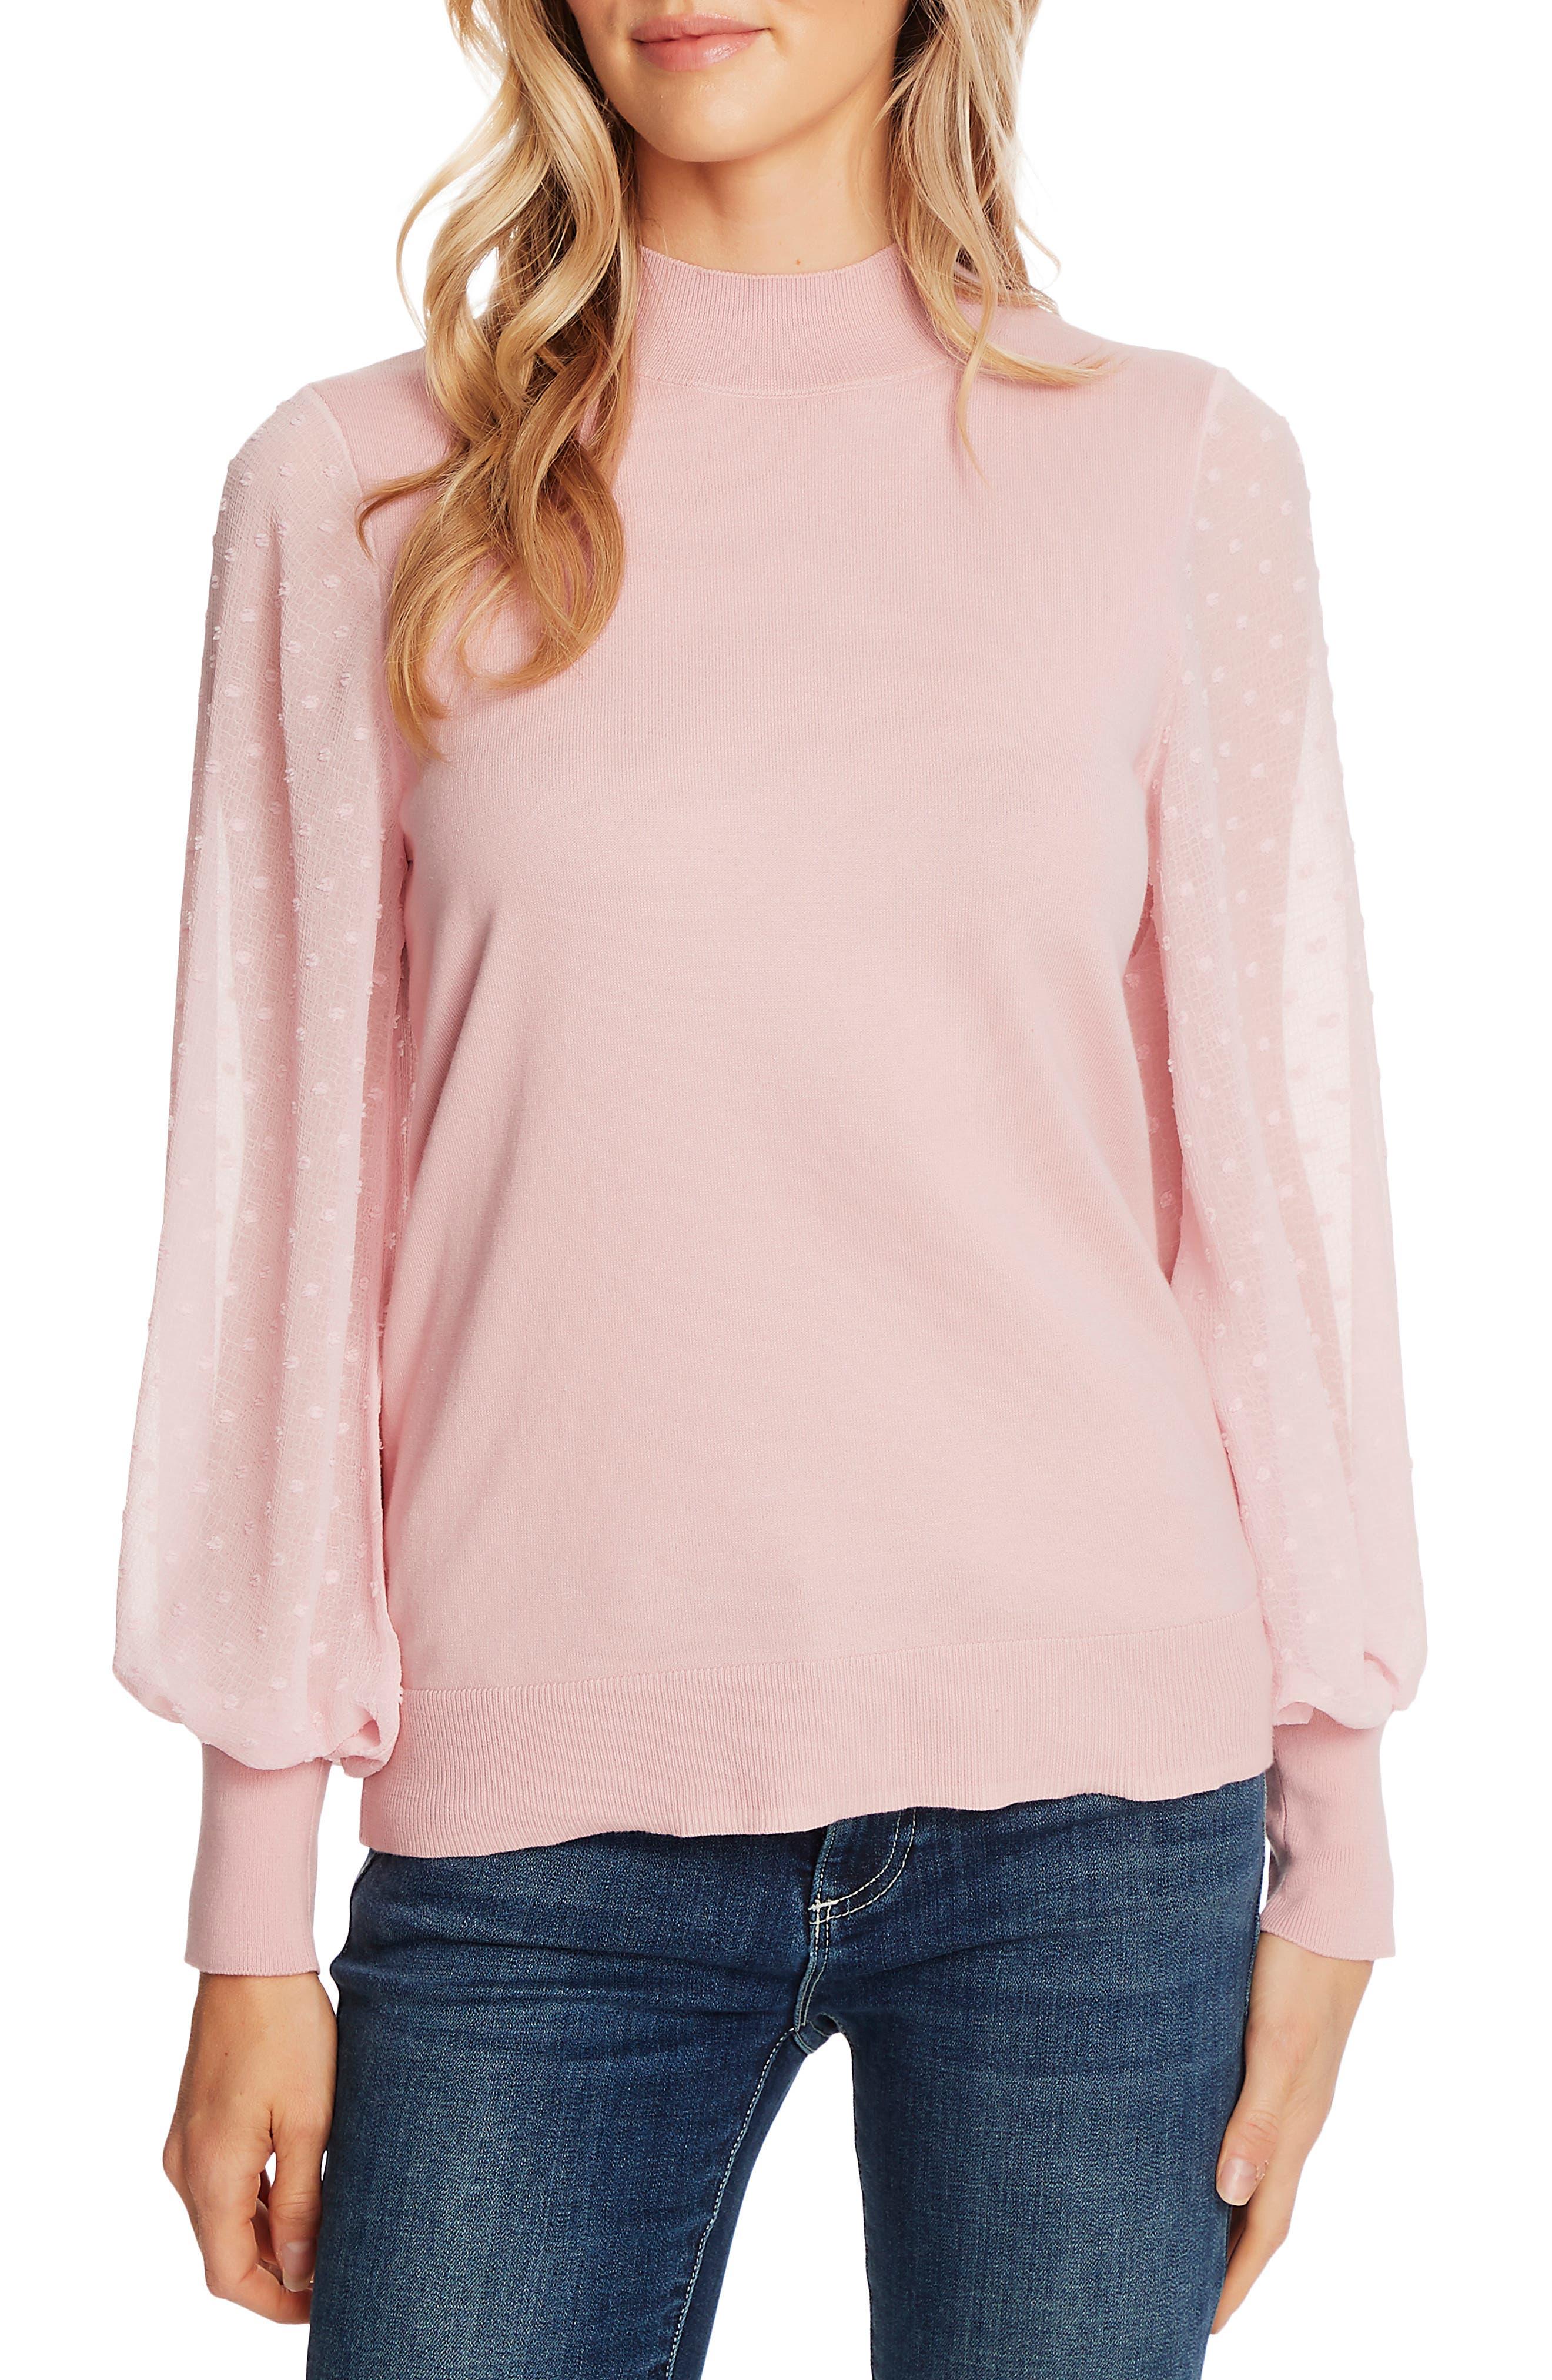 CeCe Clip Dot Sleeve Sweater